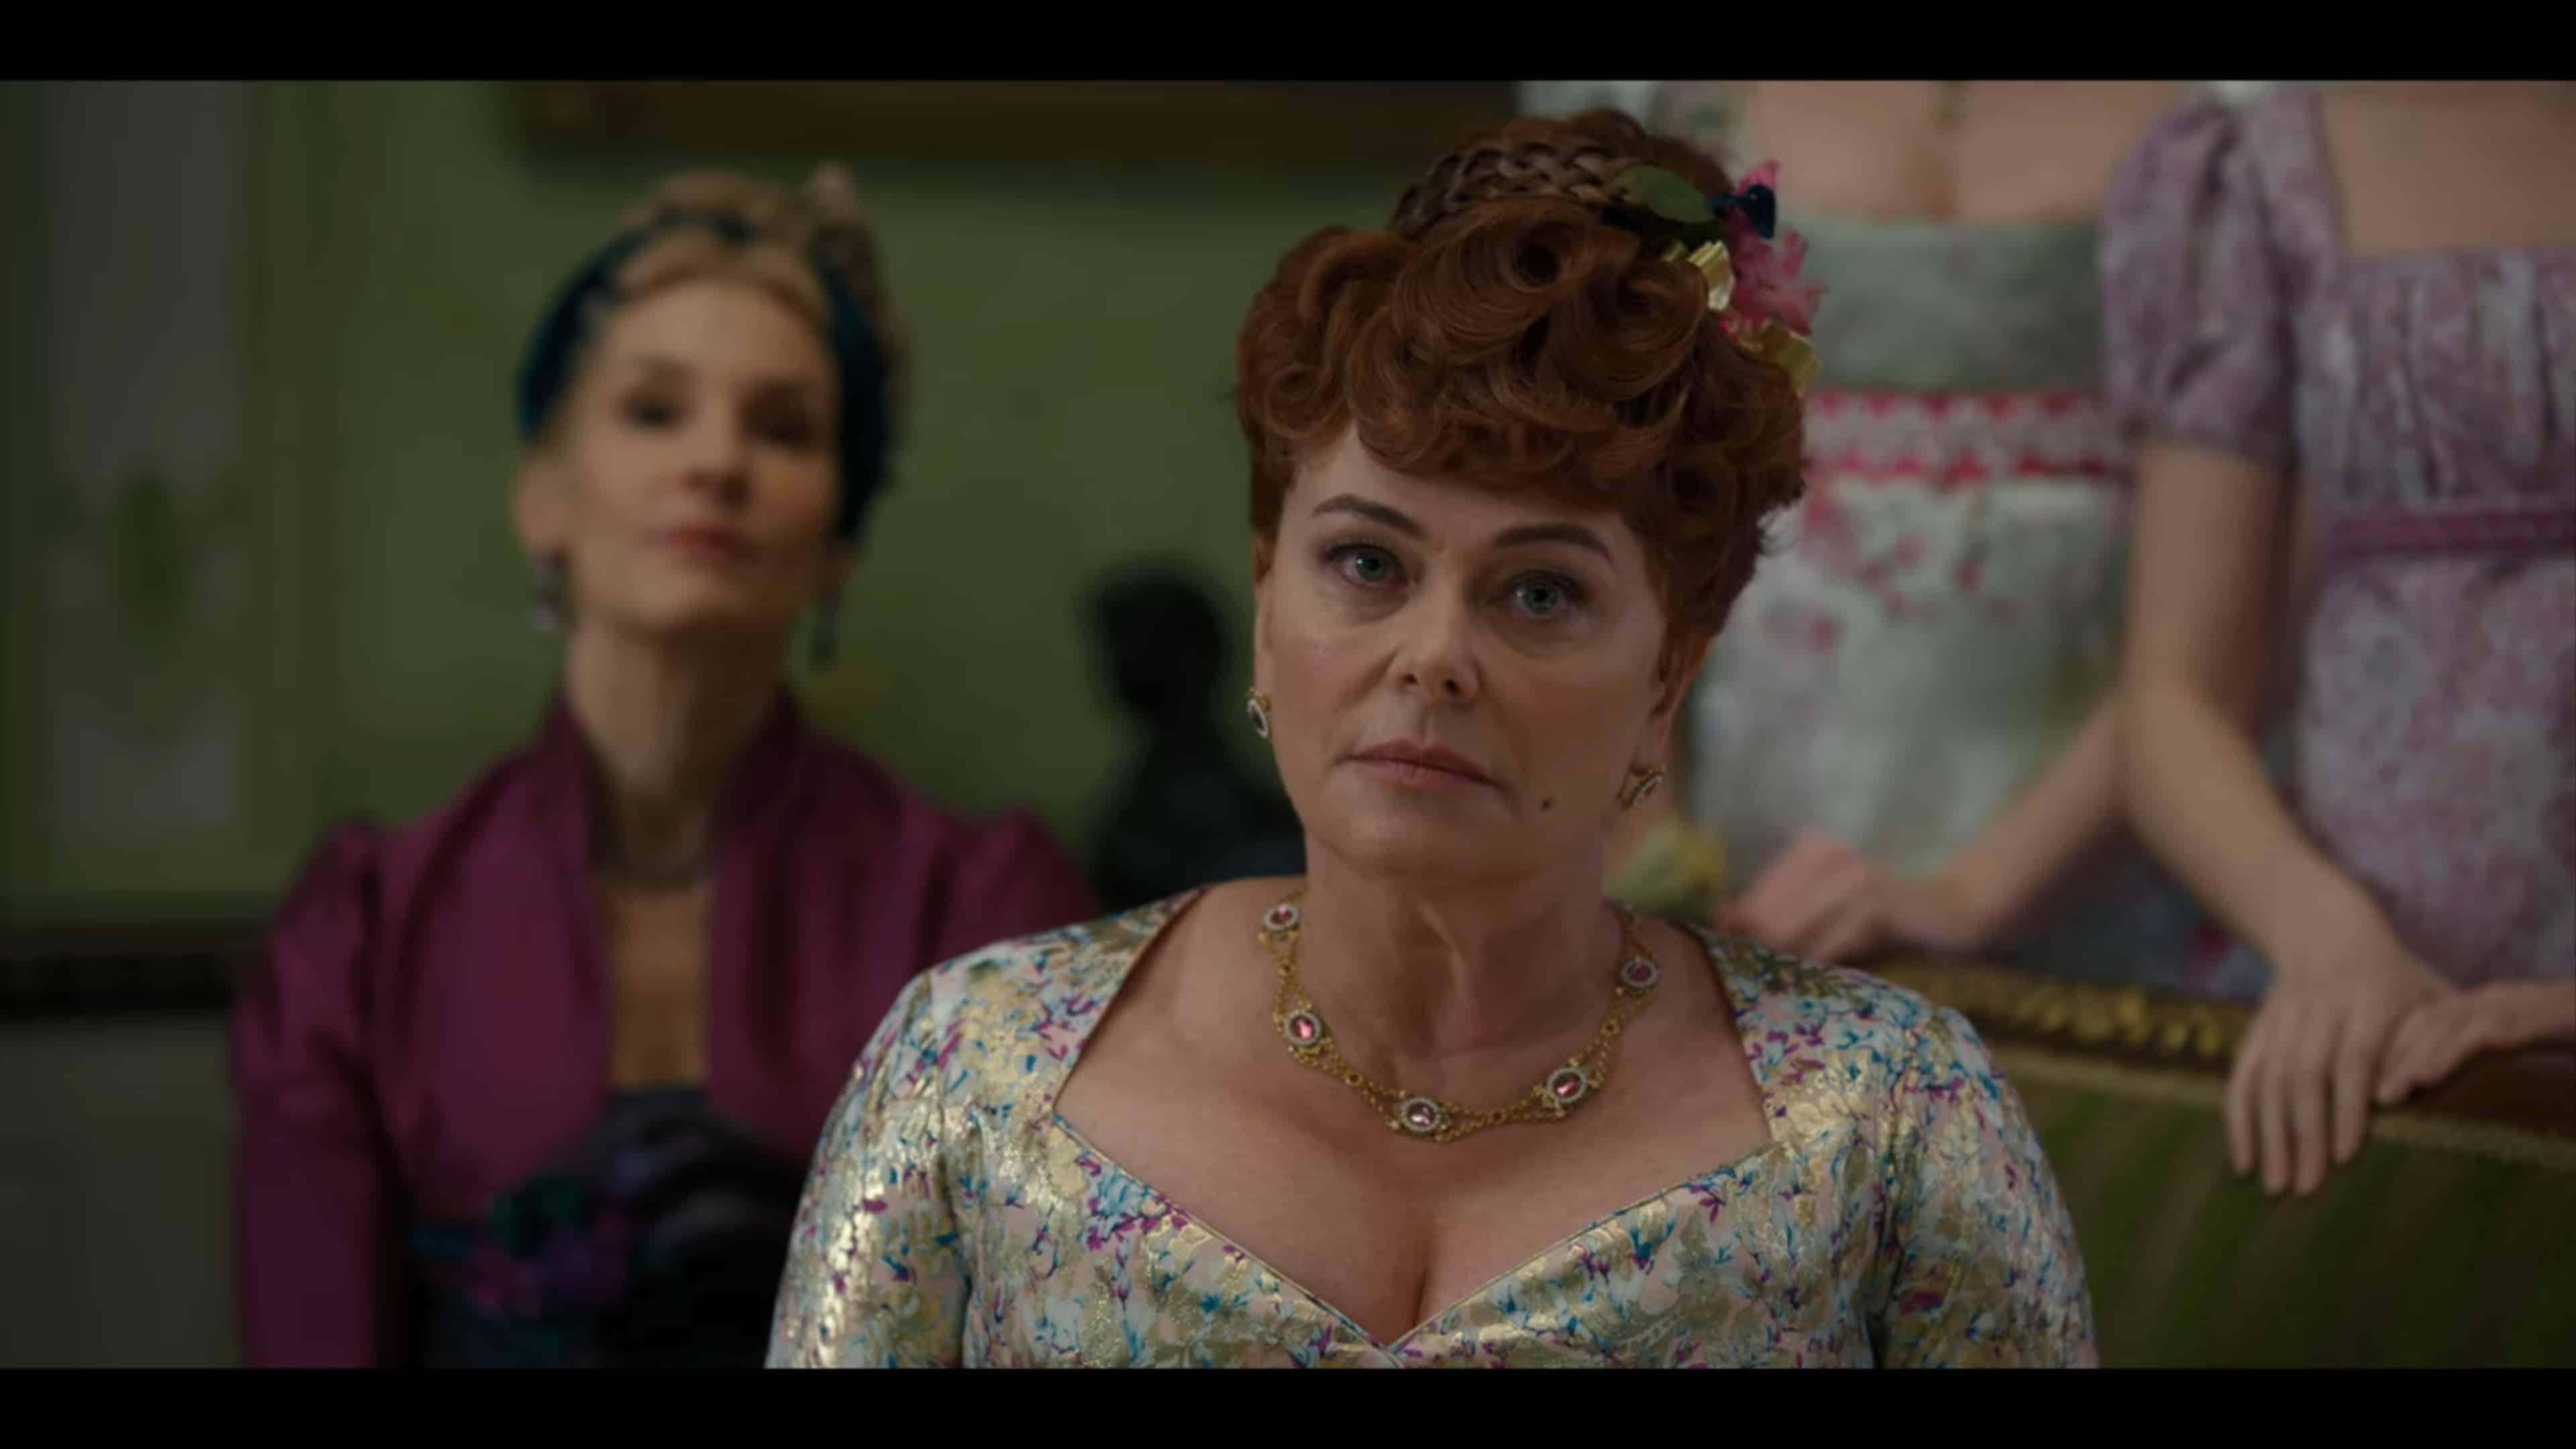 Lady Portia (Polly Walker) at a ball